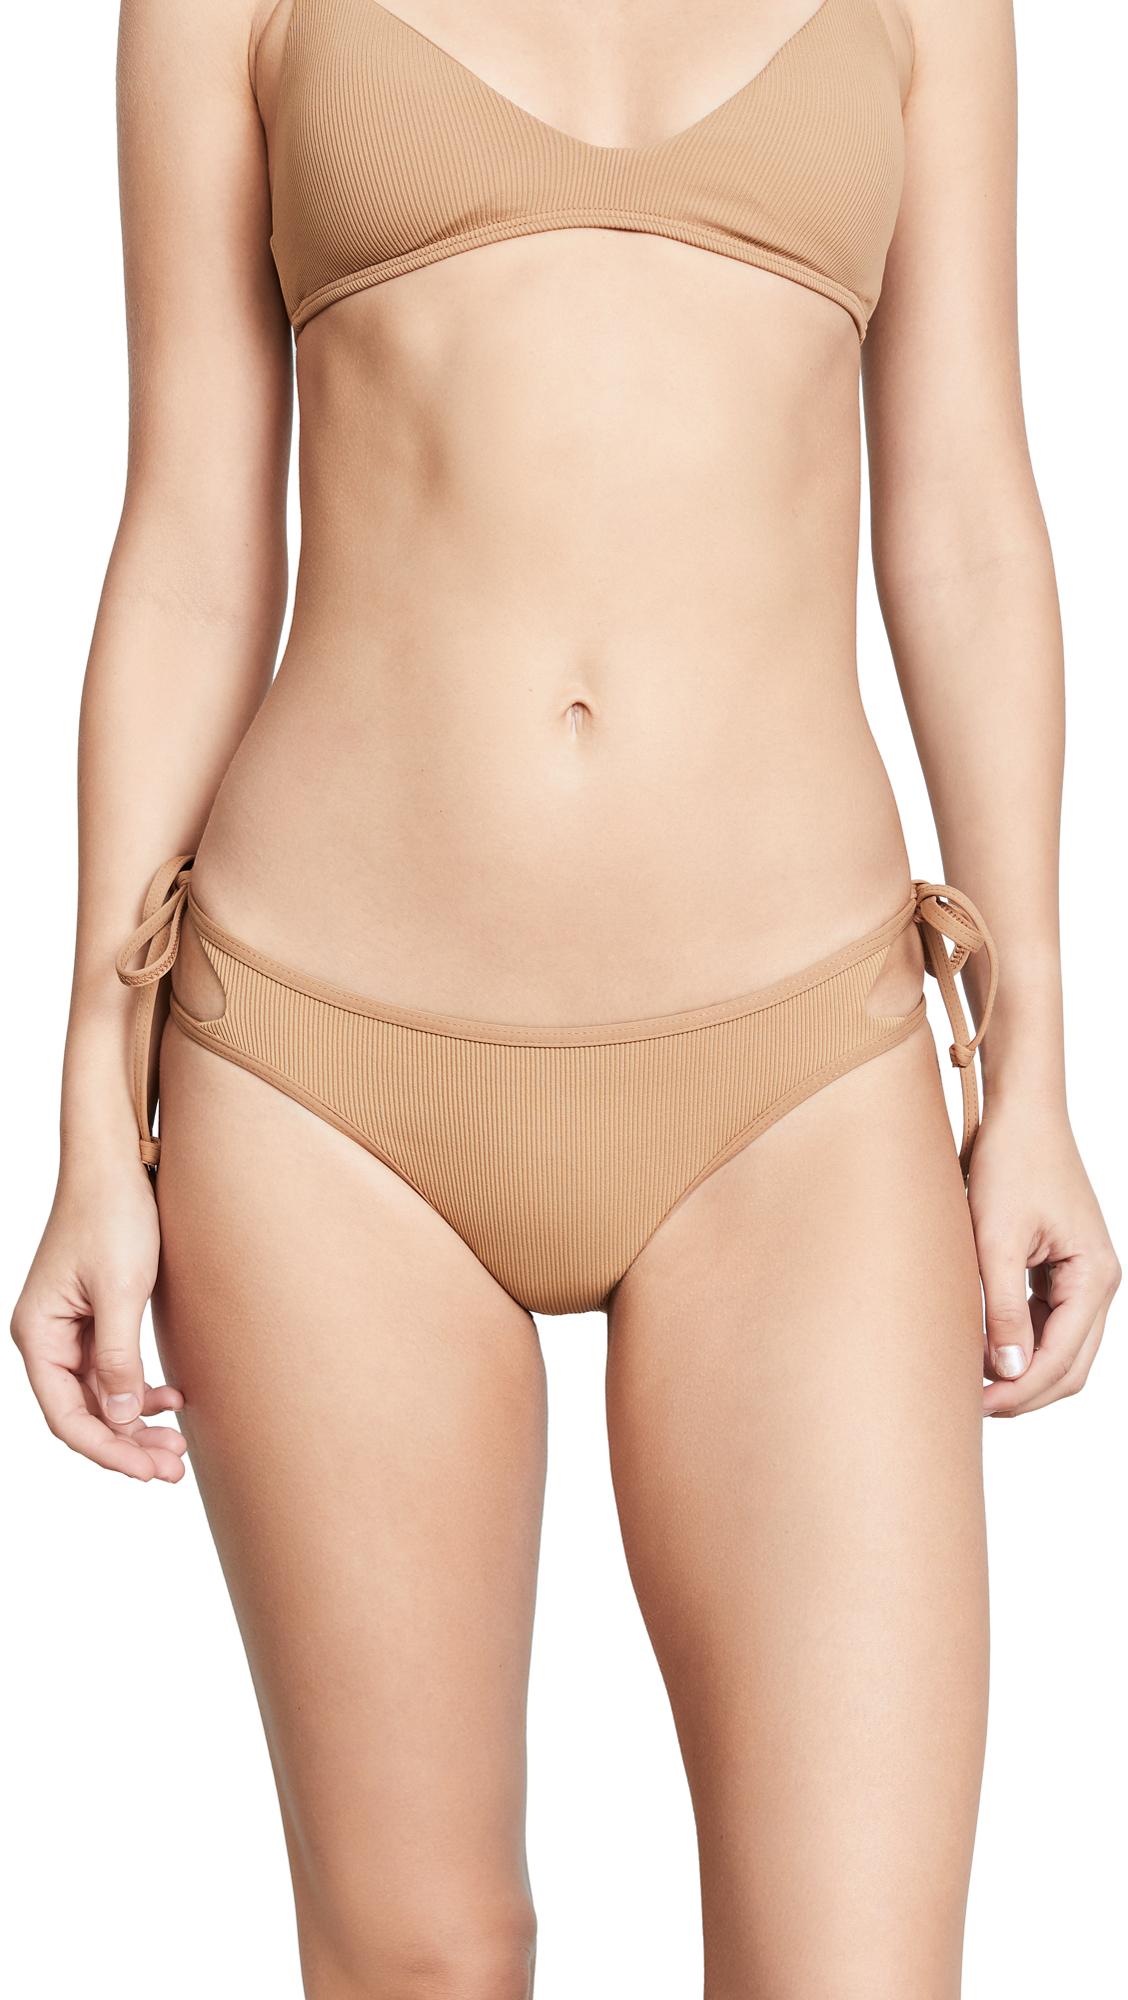 L*Space Ridin' High Ribbed Paradise Bikini Bottoms In Camel